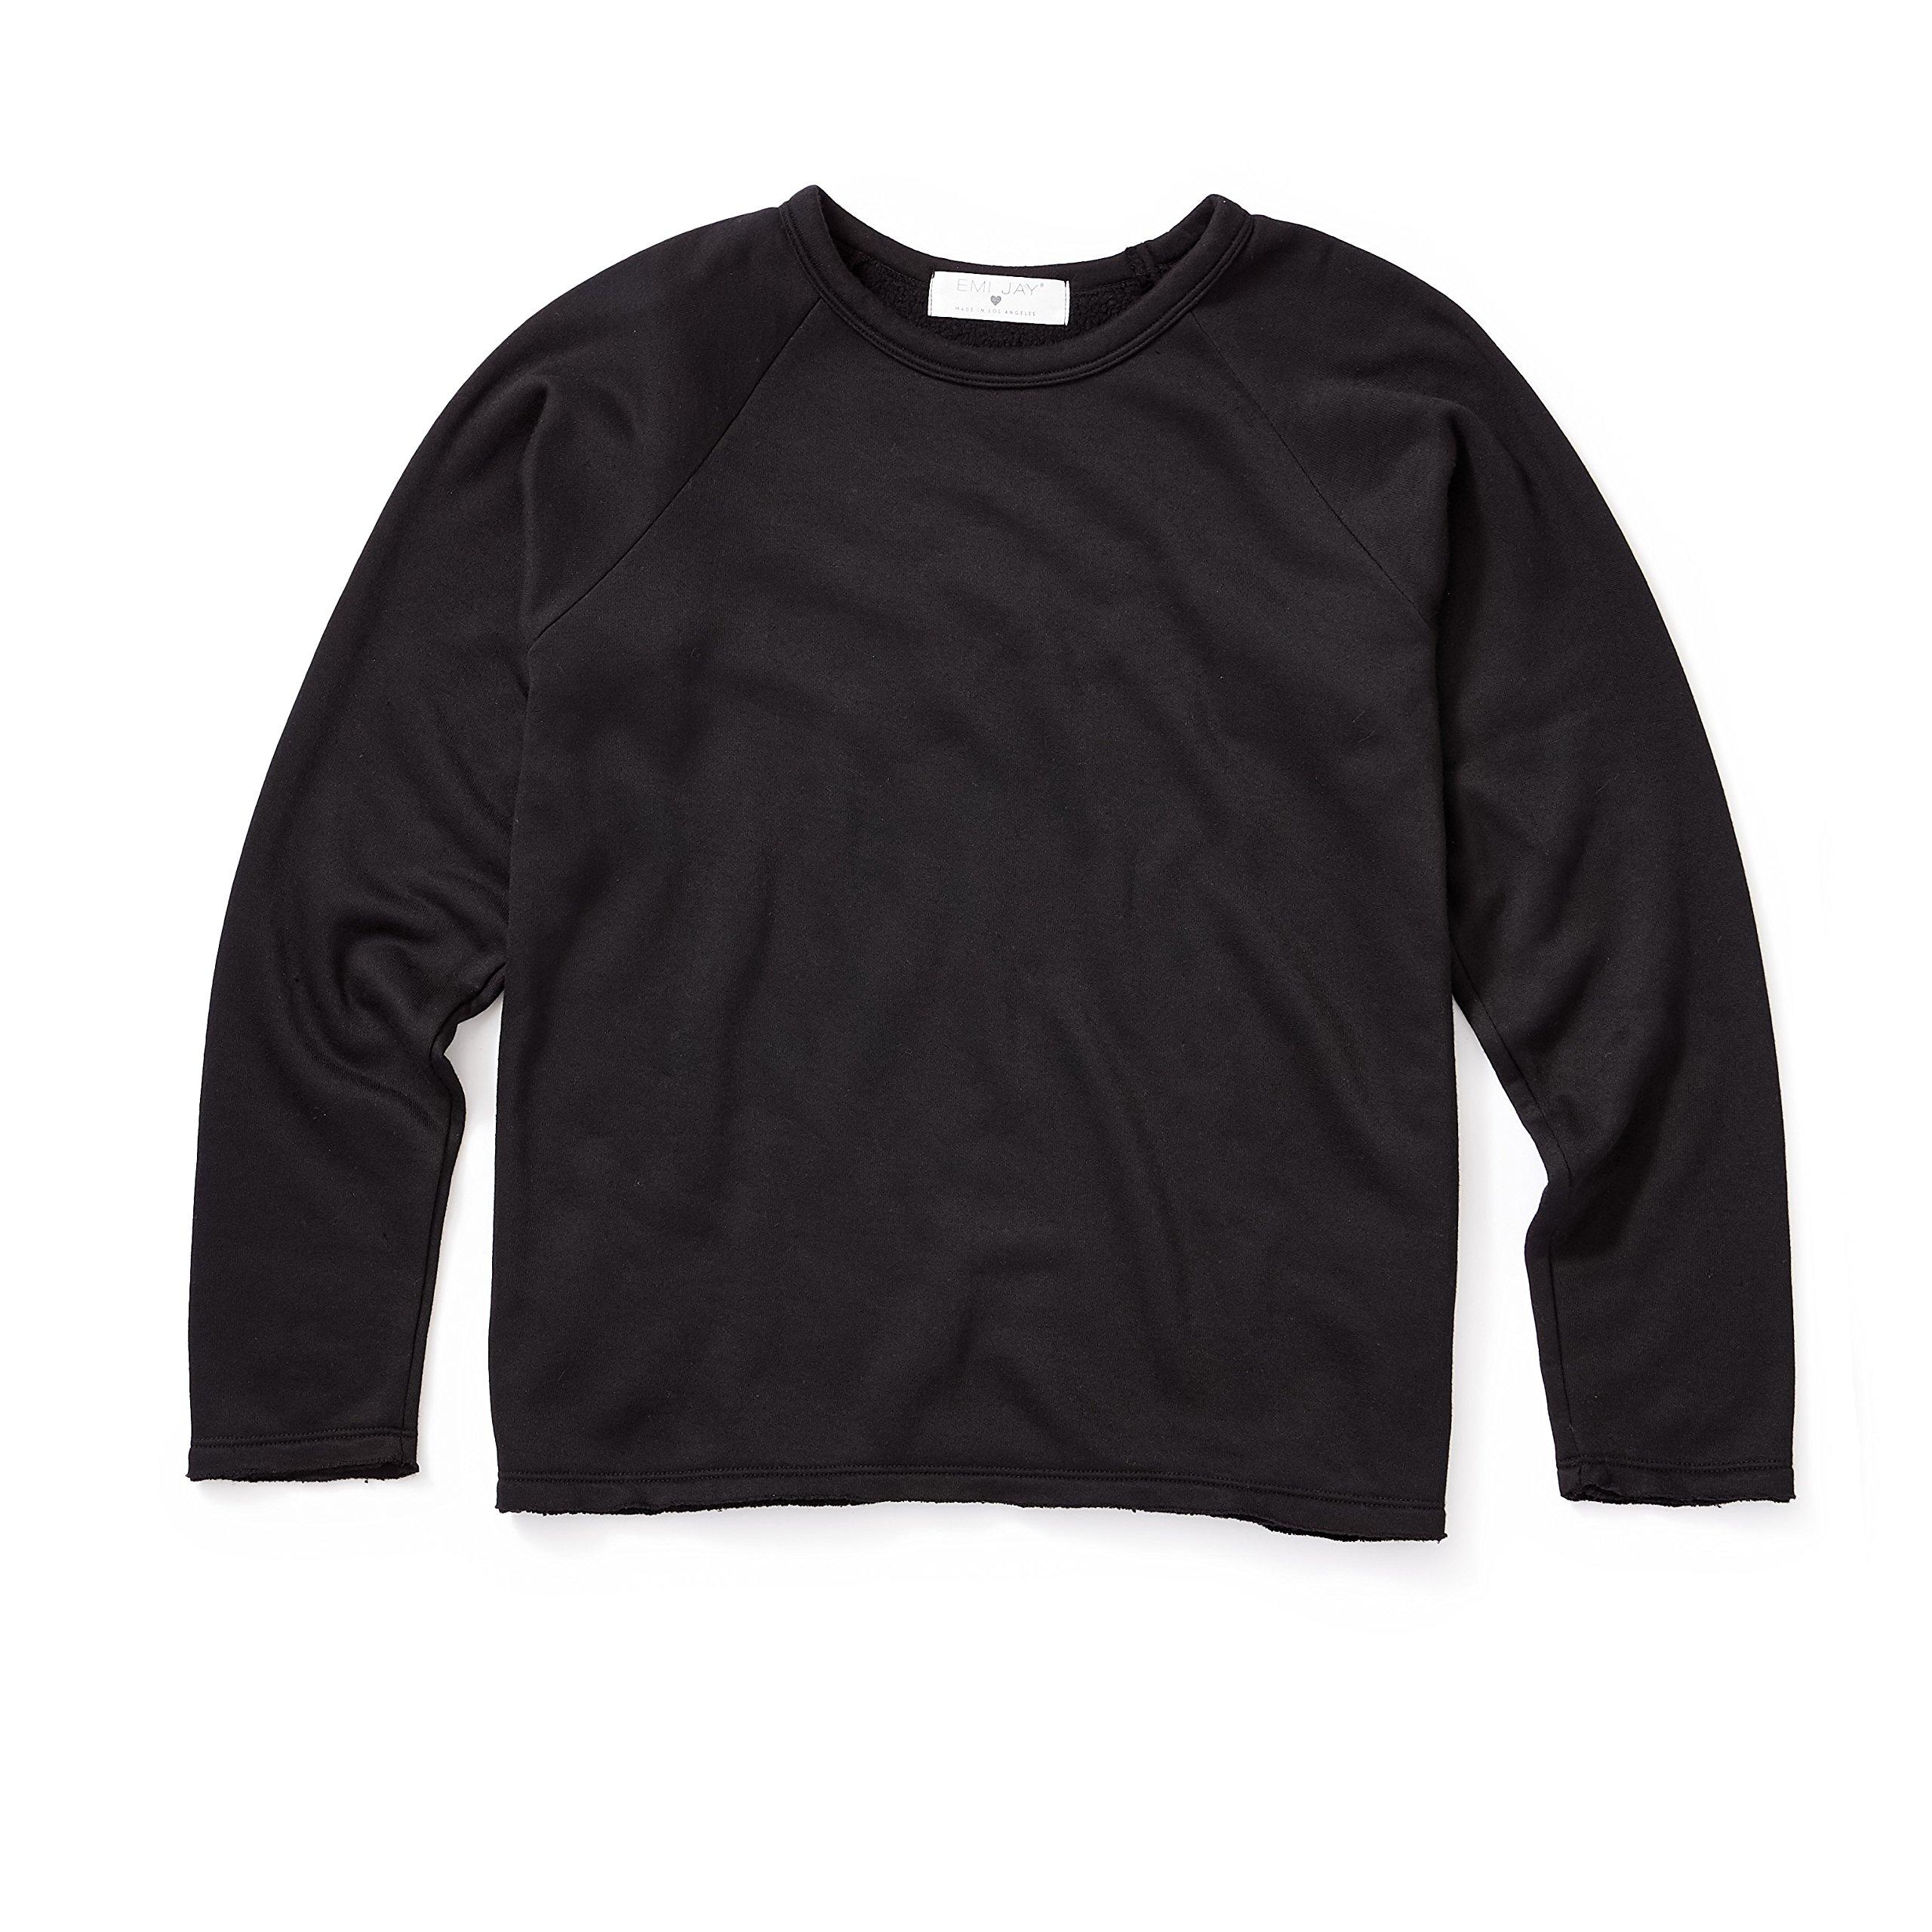 EmiJay Inc Womens Smoosh Sweatshirt Large/Xlarge Black by EmiJay Inc